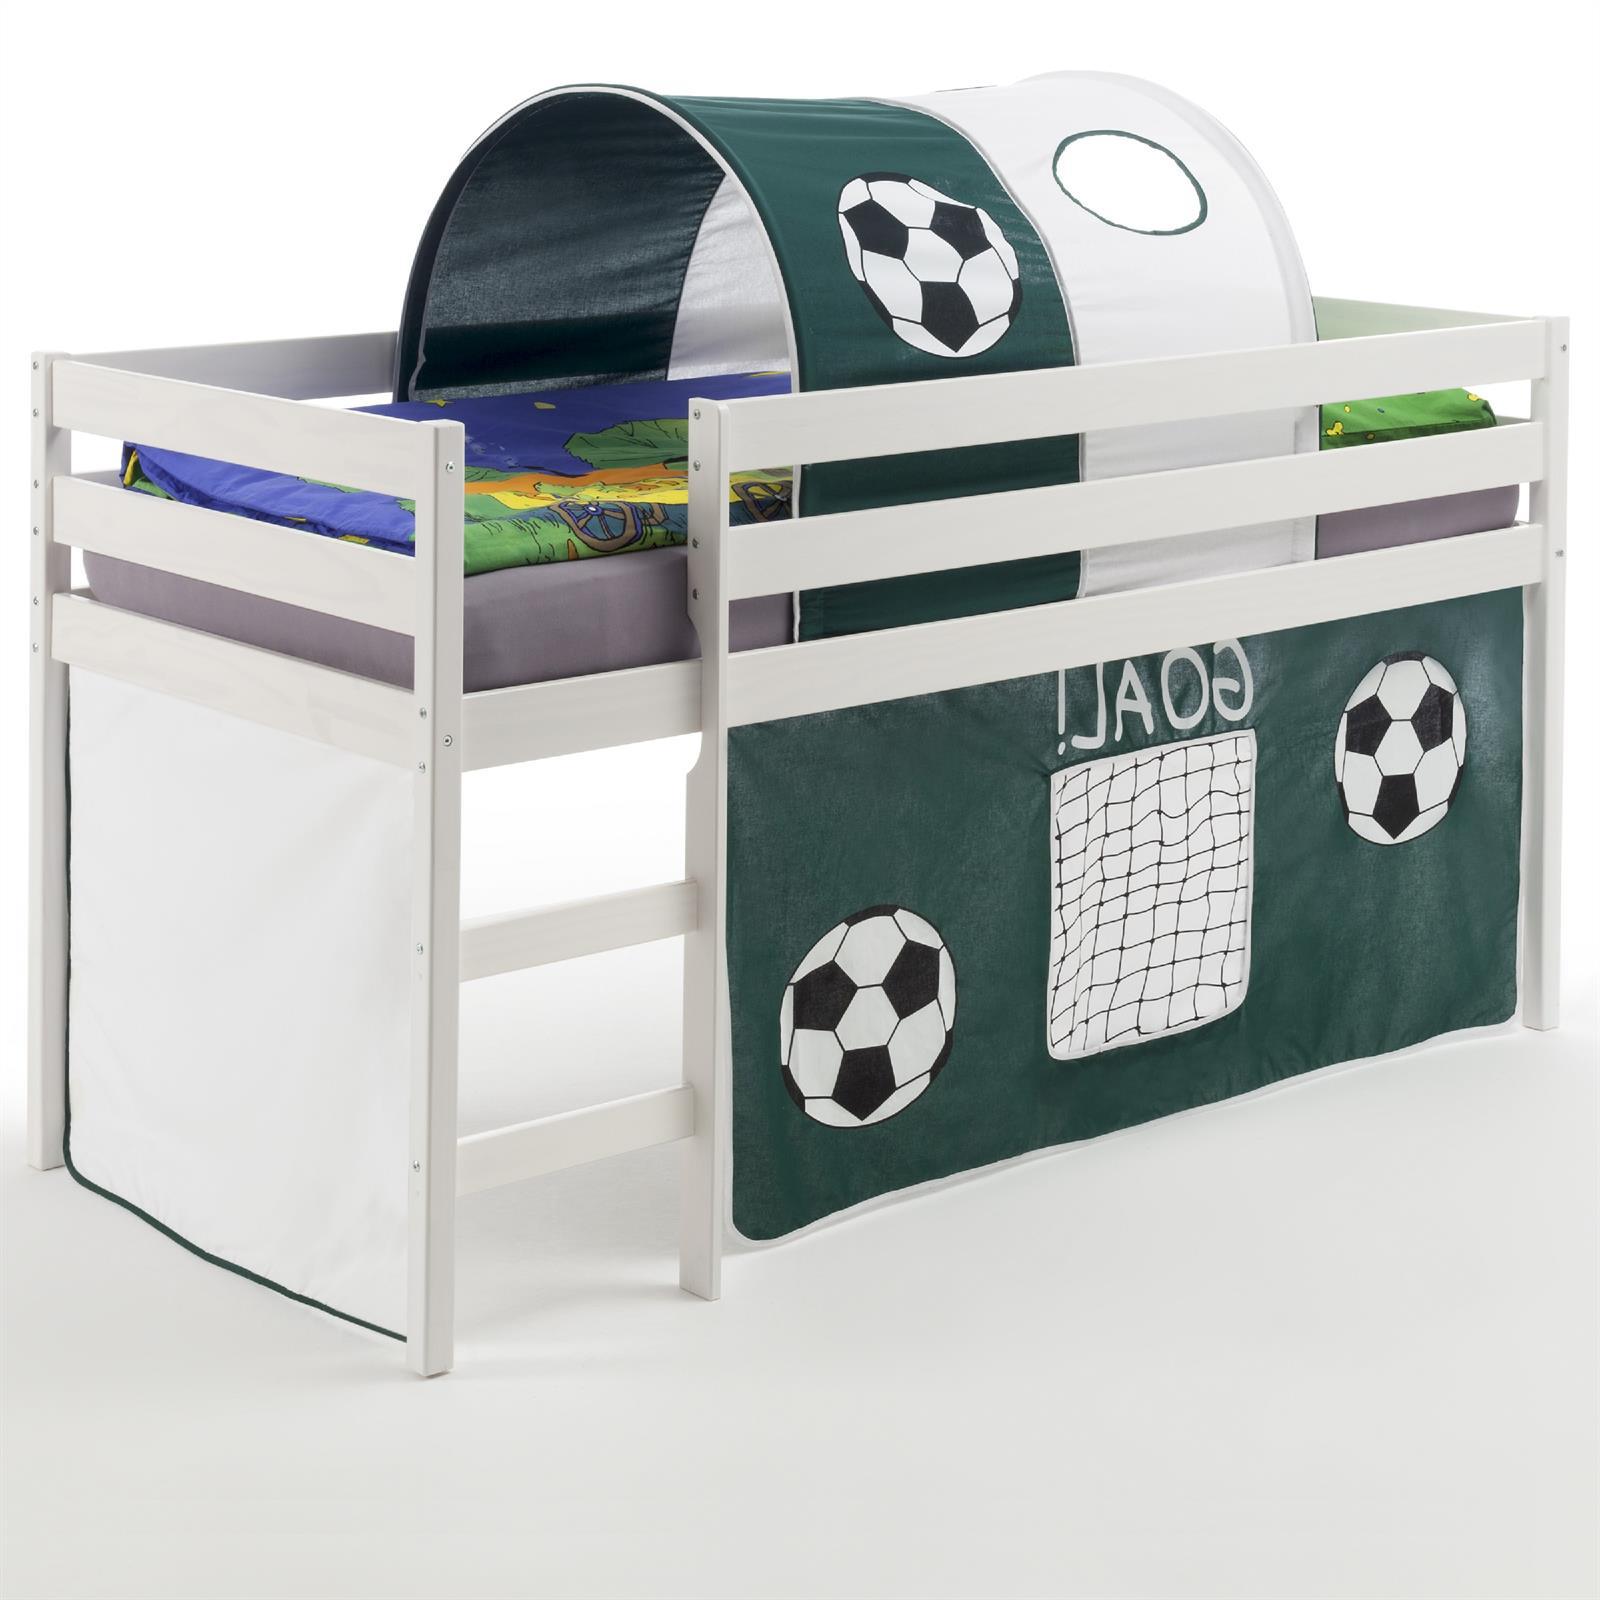 hochbett mit fu ball vorhang tunnel caro m bel. Black Bedroom Furniture Sets. Home Design Ideas